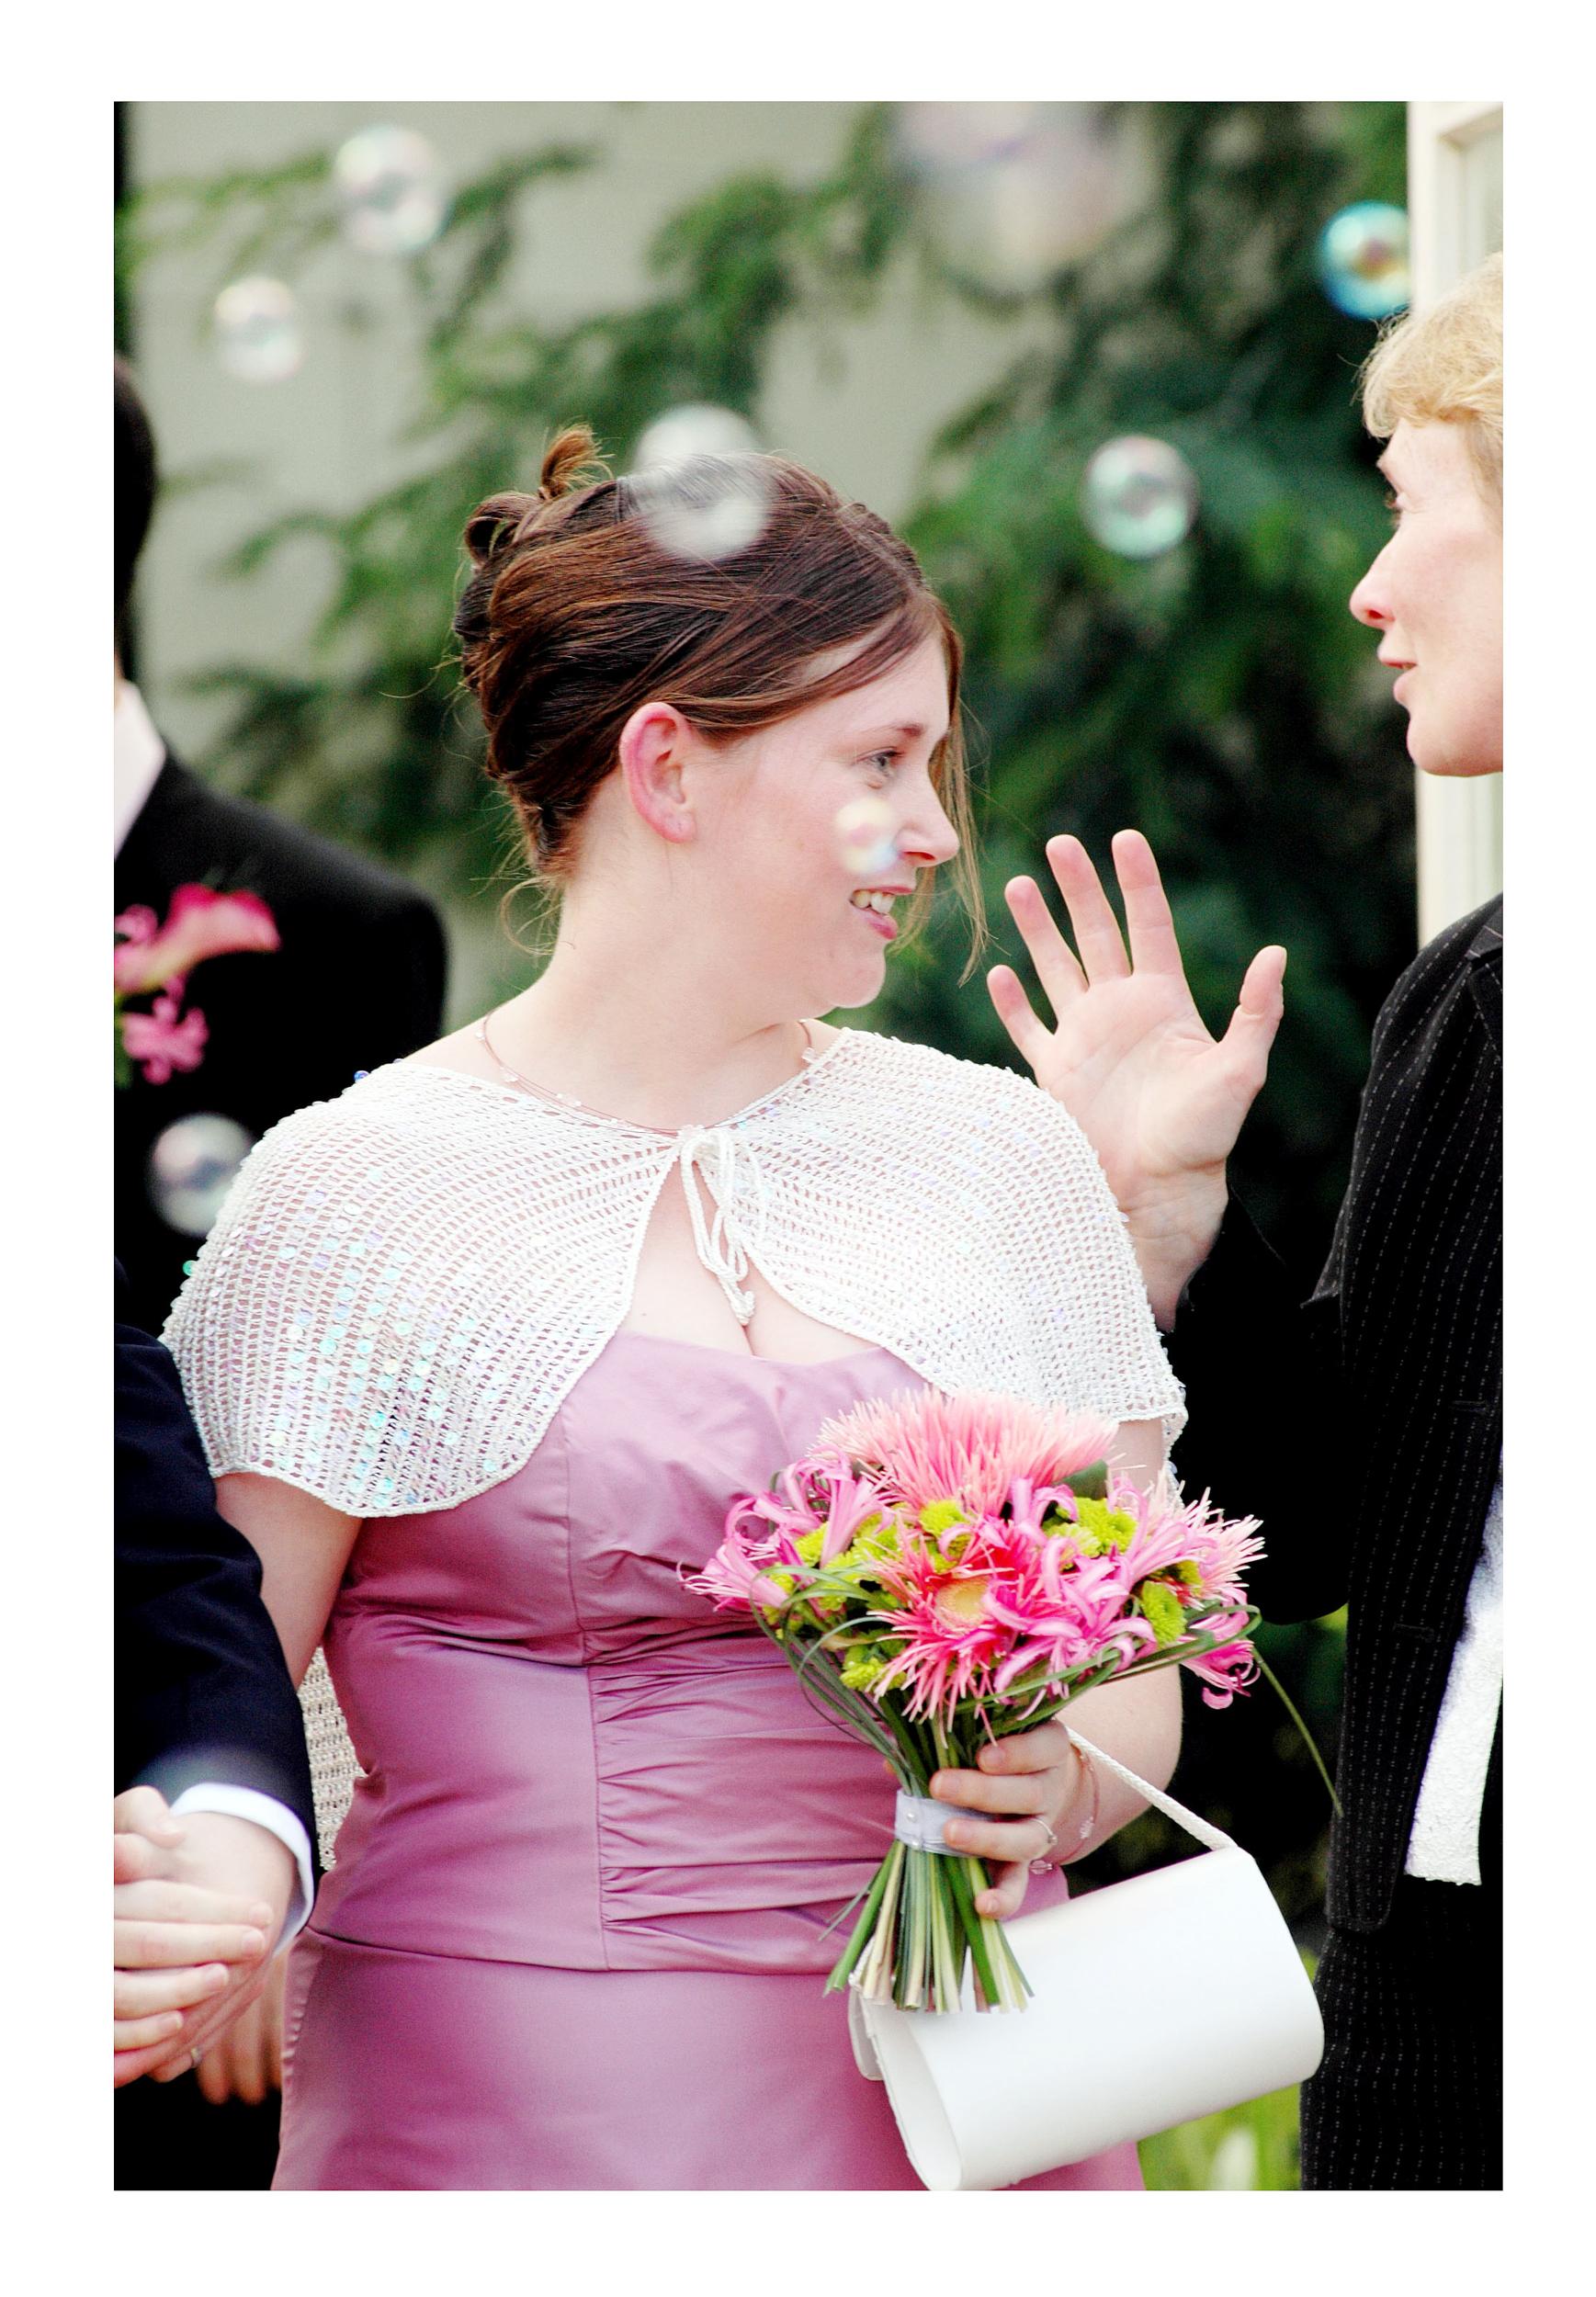 REPORTAGE-WEDDING-PHOTOGRAPHY-SET-UK-23.jpg